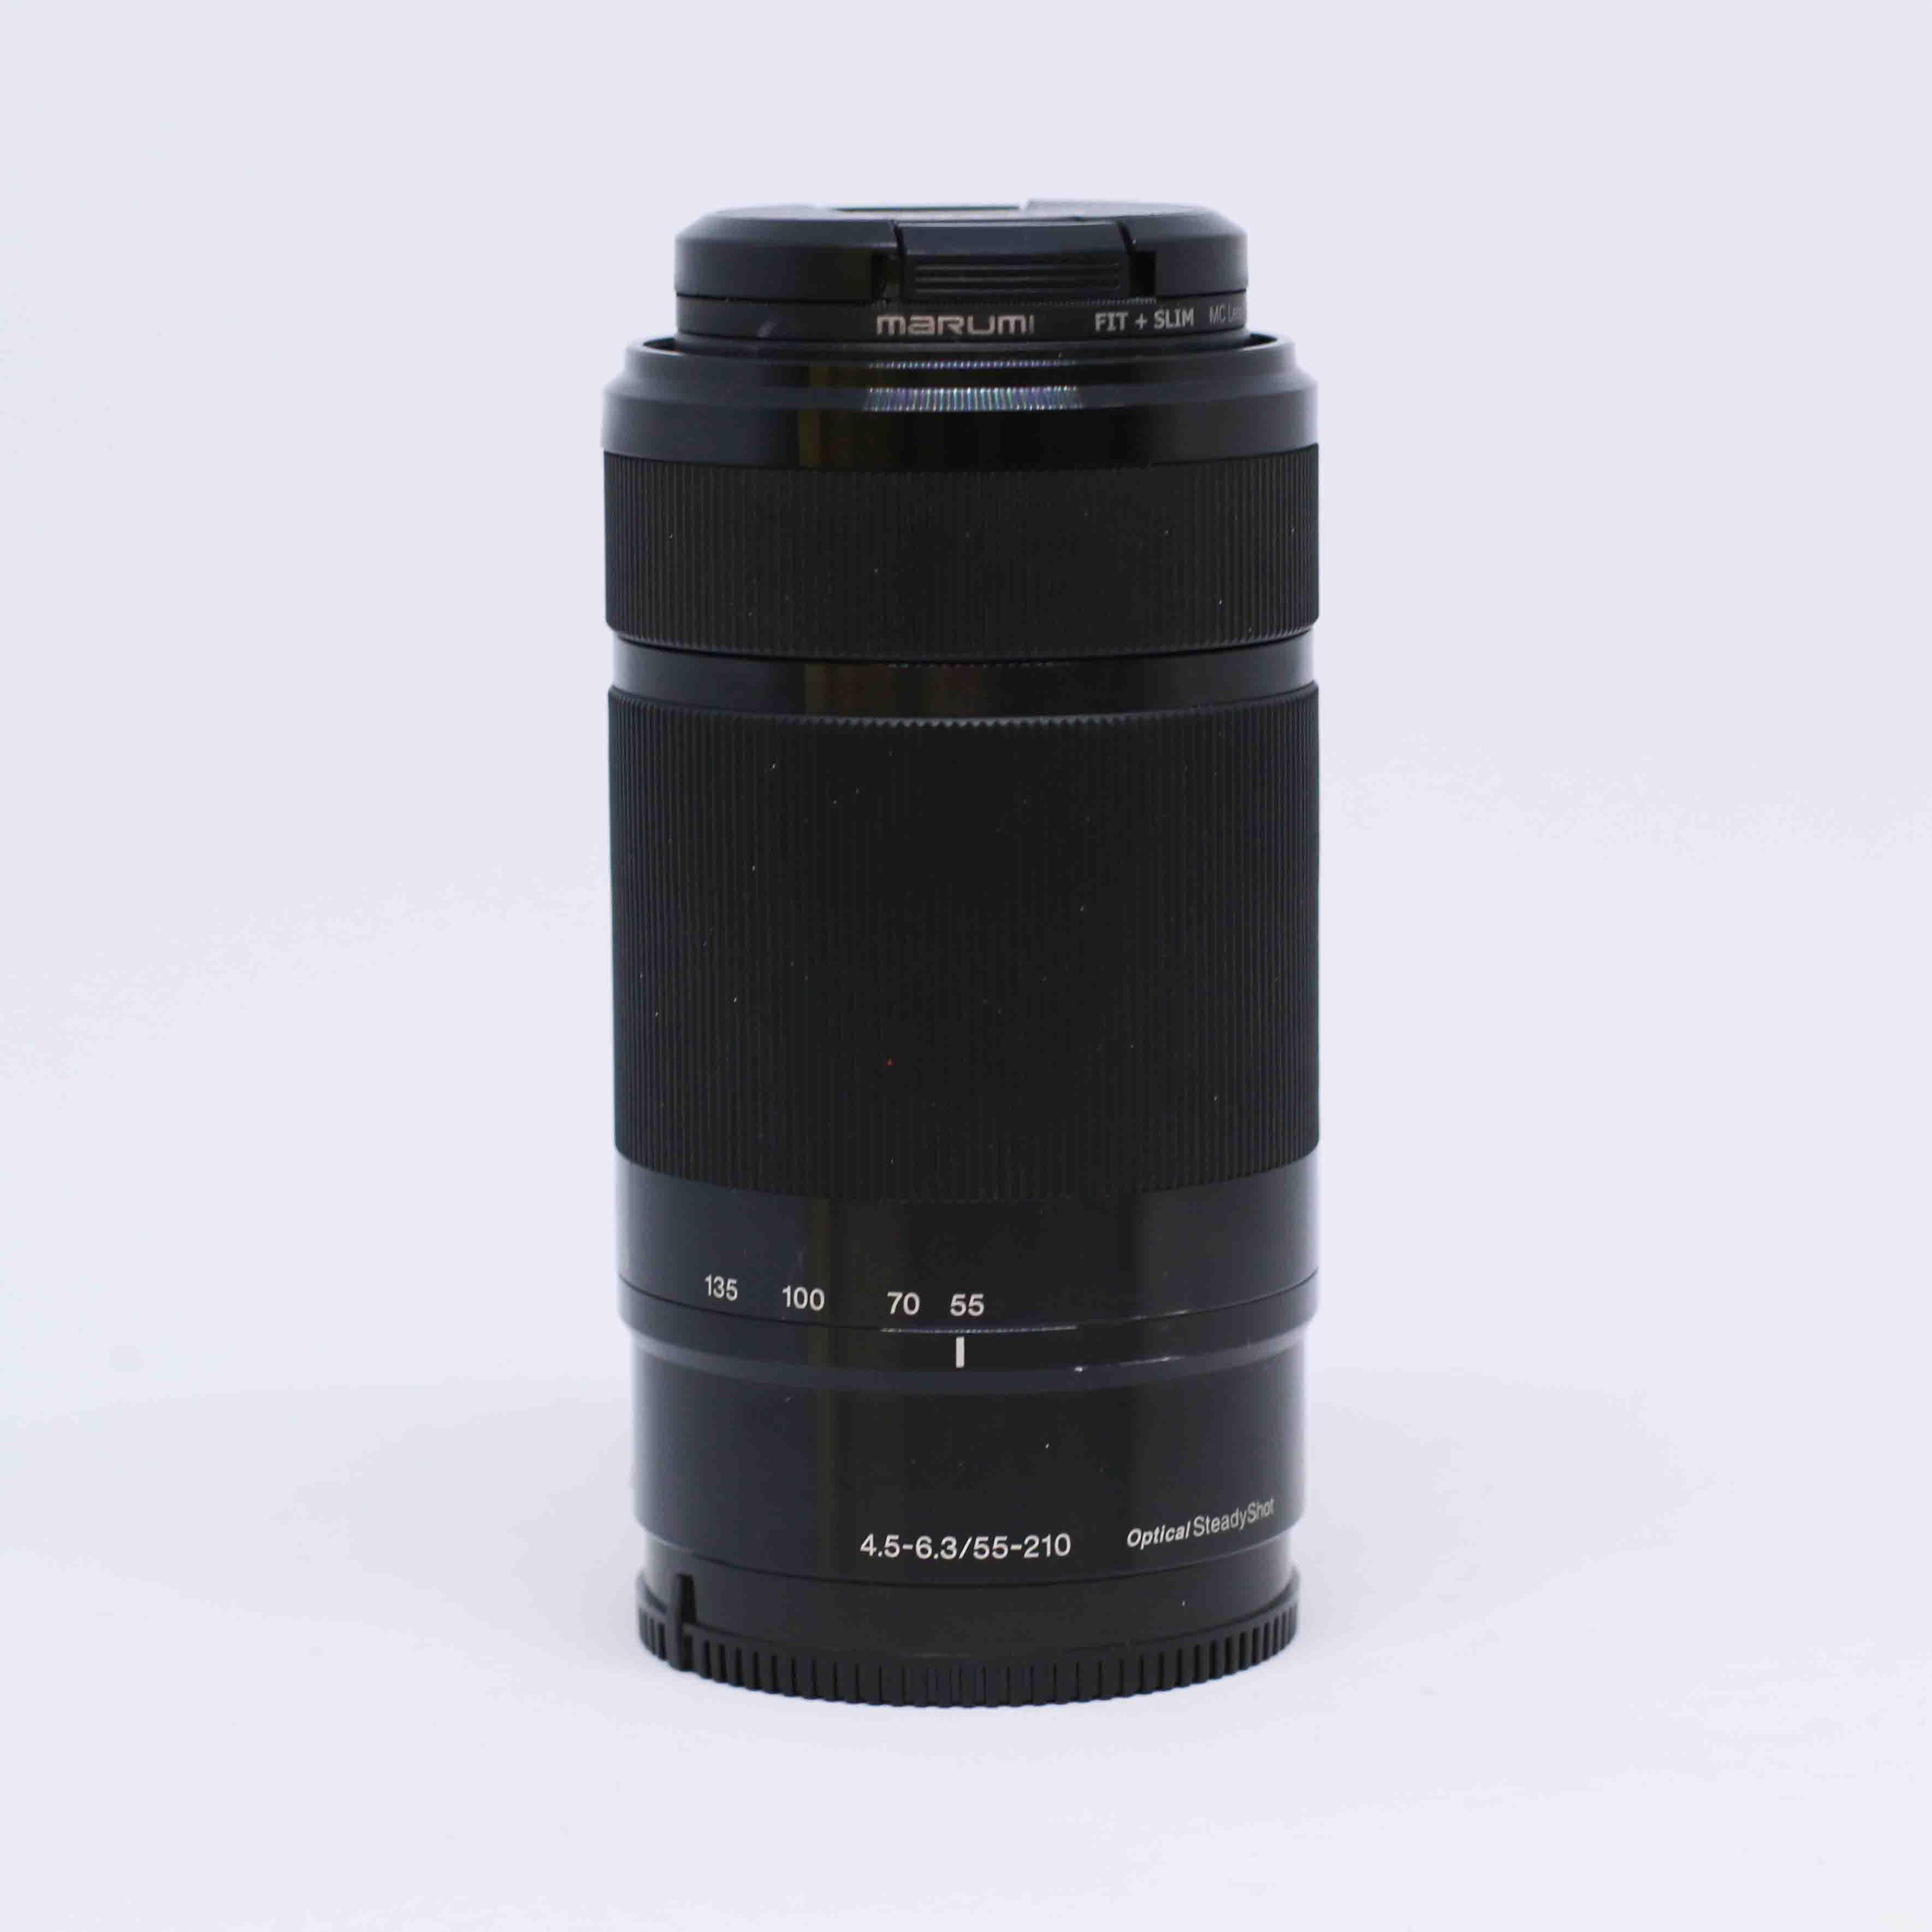 Sony Sel 55-210mm F/4.5-6.3